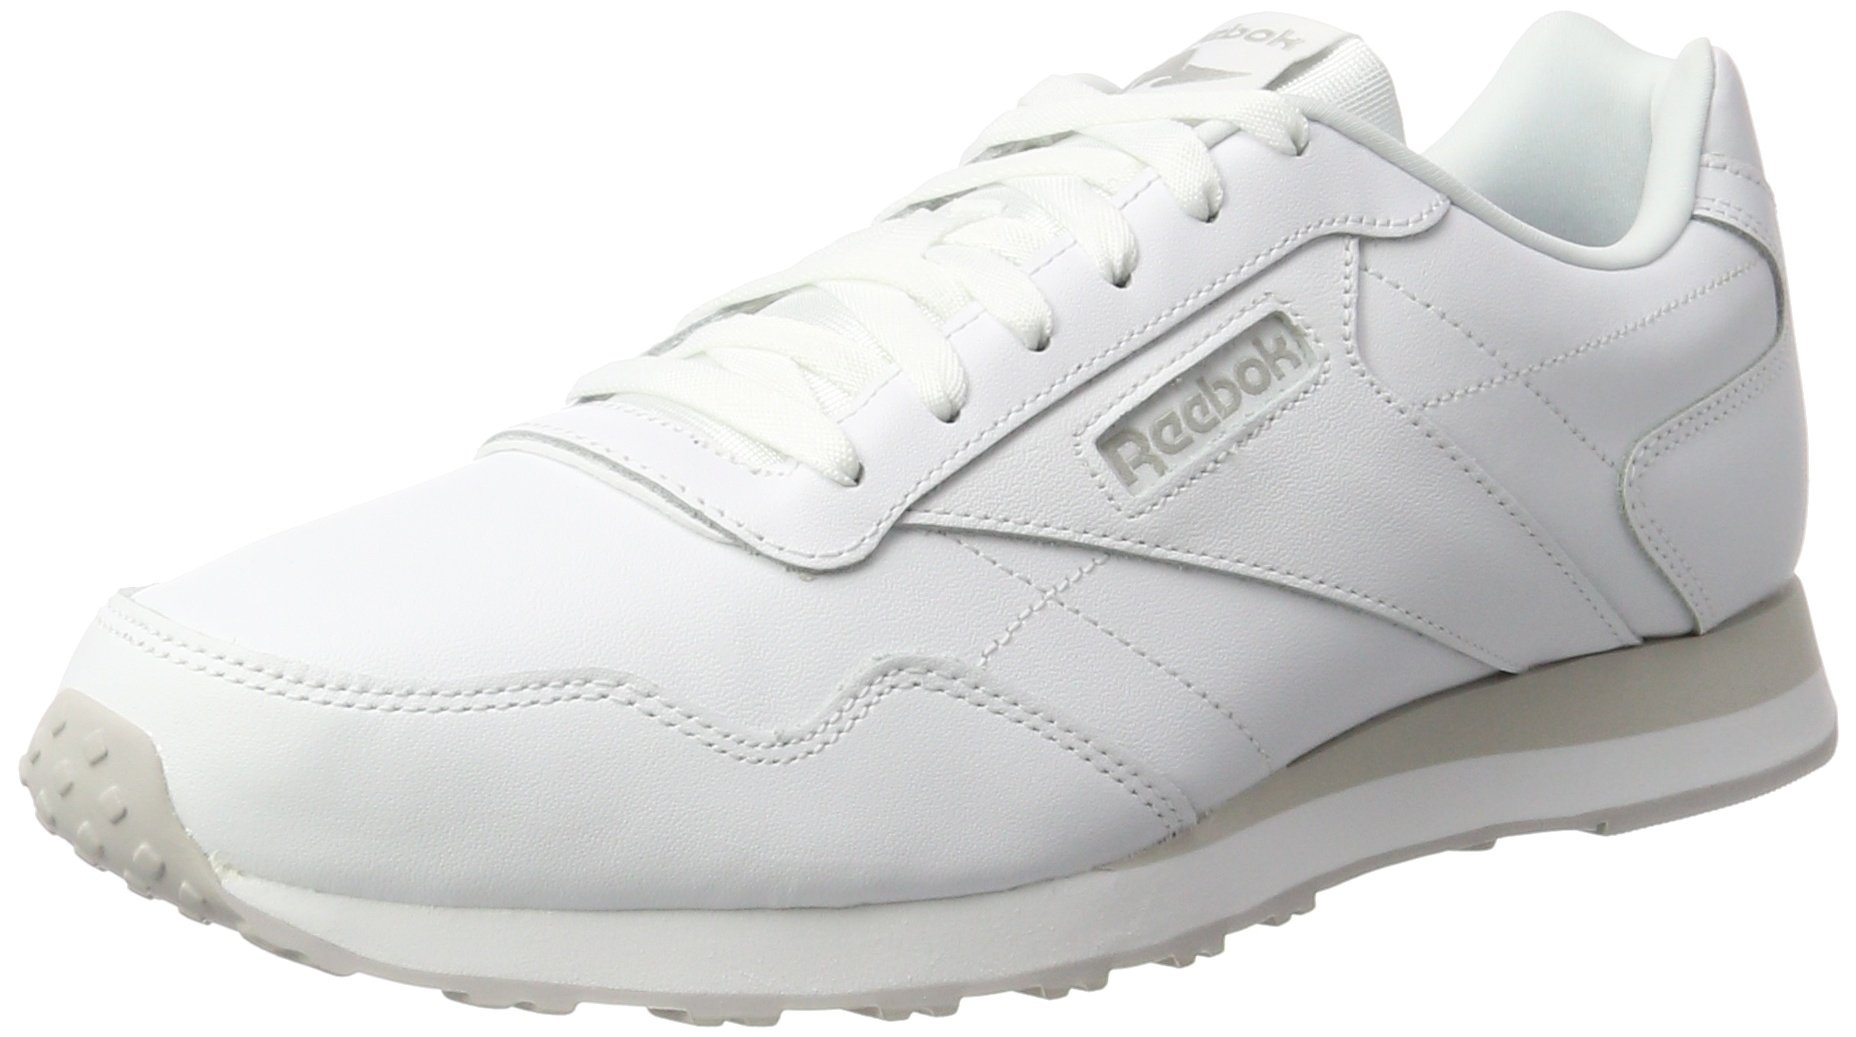 Reebok Herren Royal Glide Lx Fitnessschuhe, Mehrfarbig White Steel 000, 47 EU